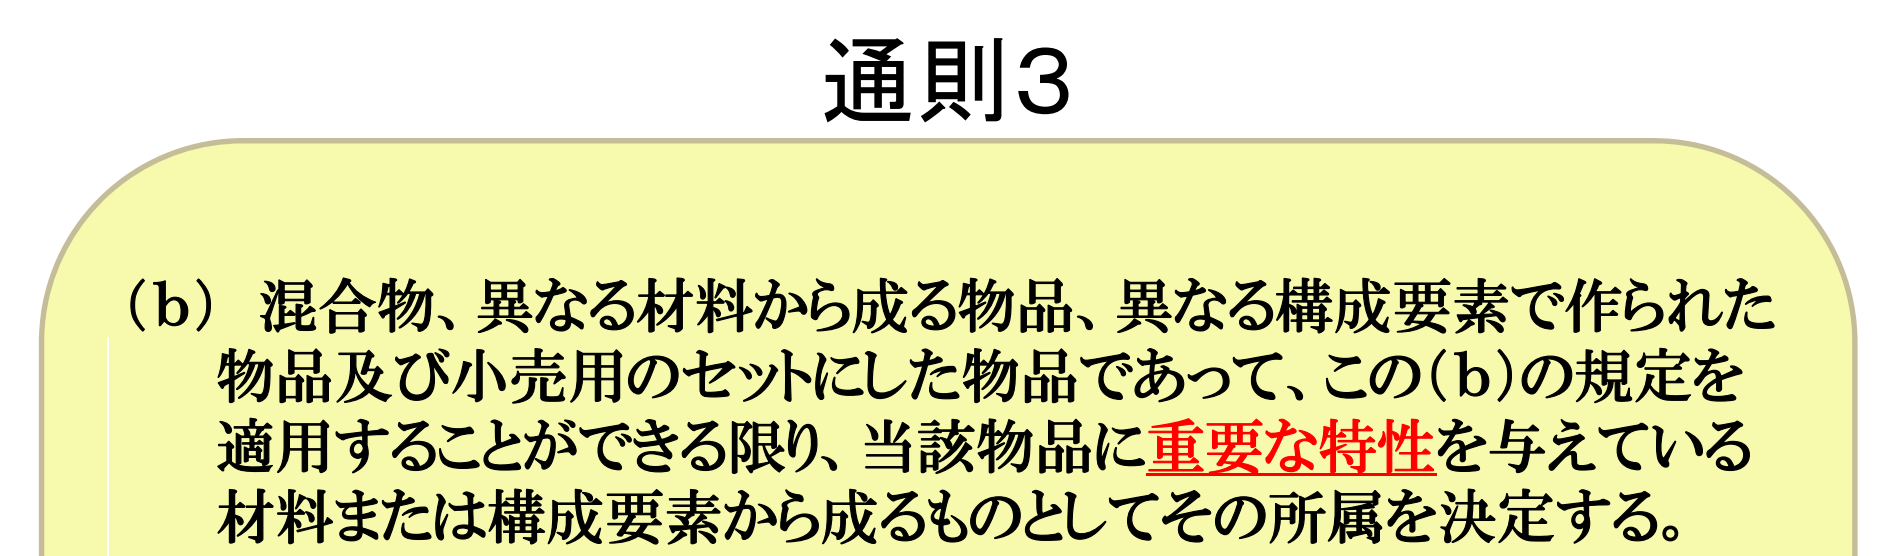 HSコード通則3(b)